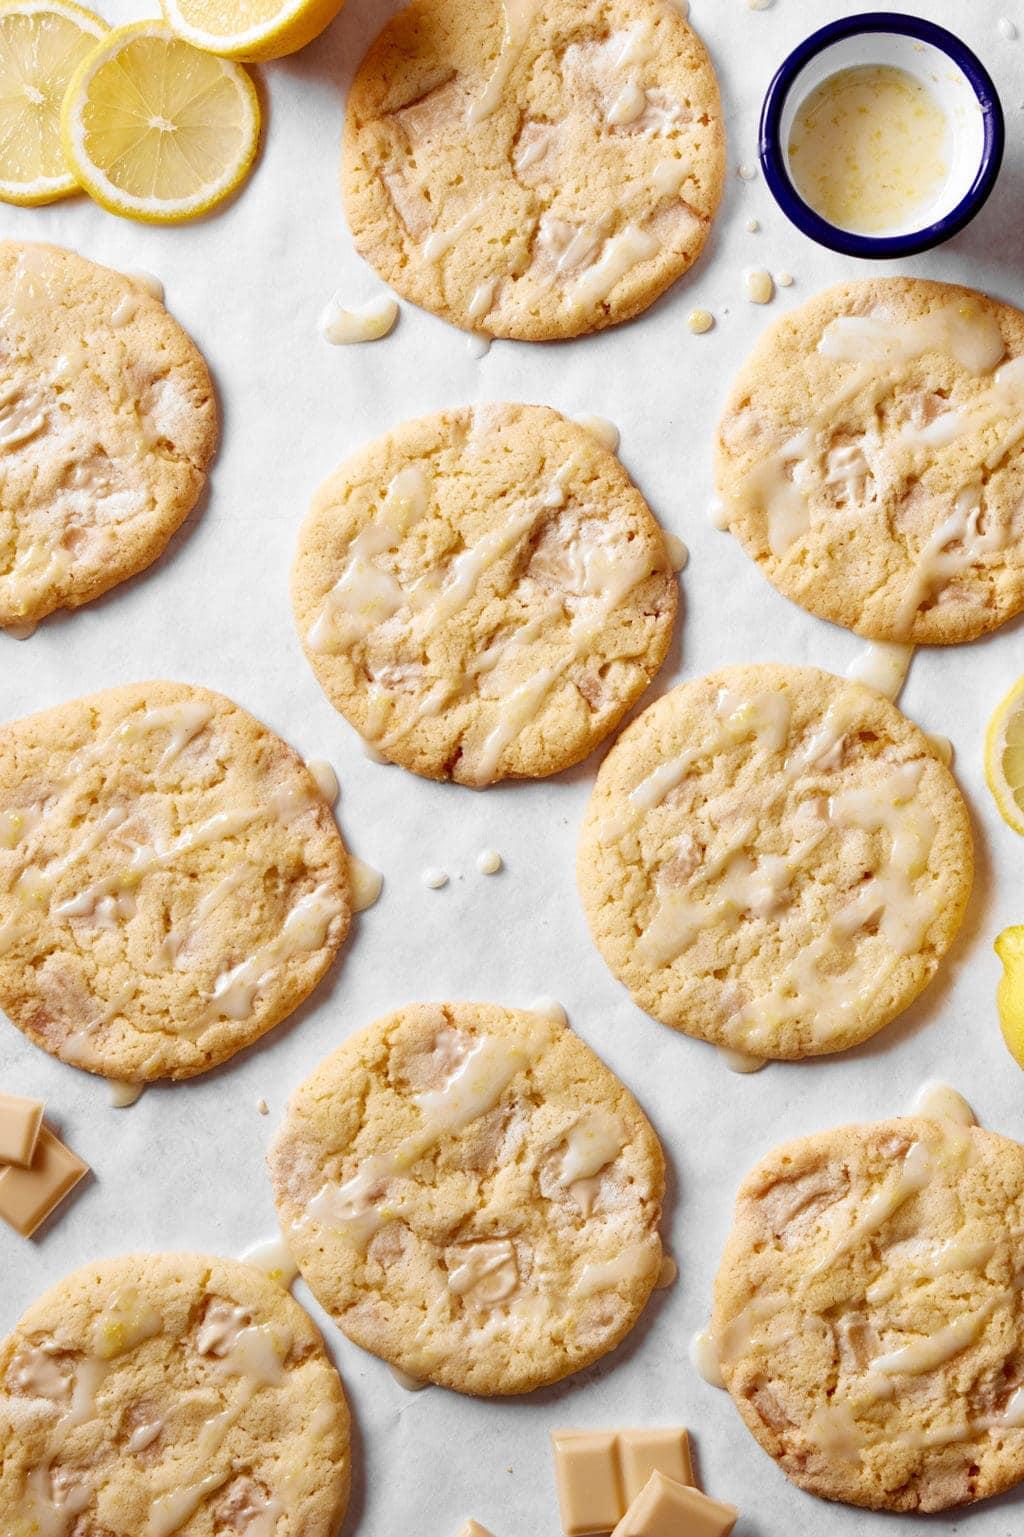 vegan lemon and white chocolate cookies